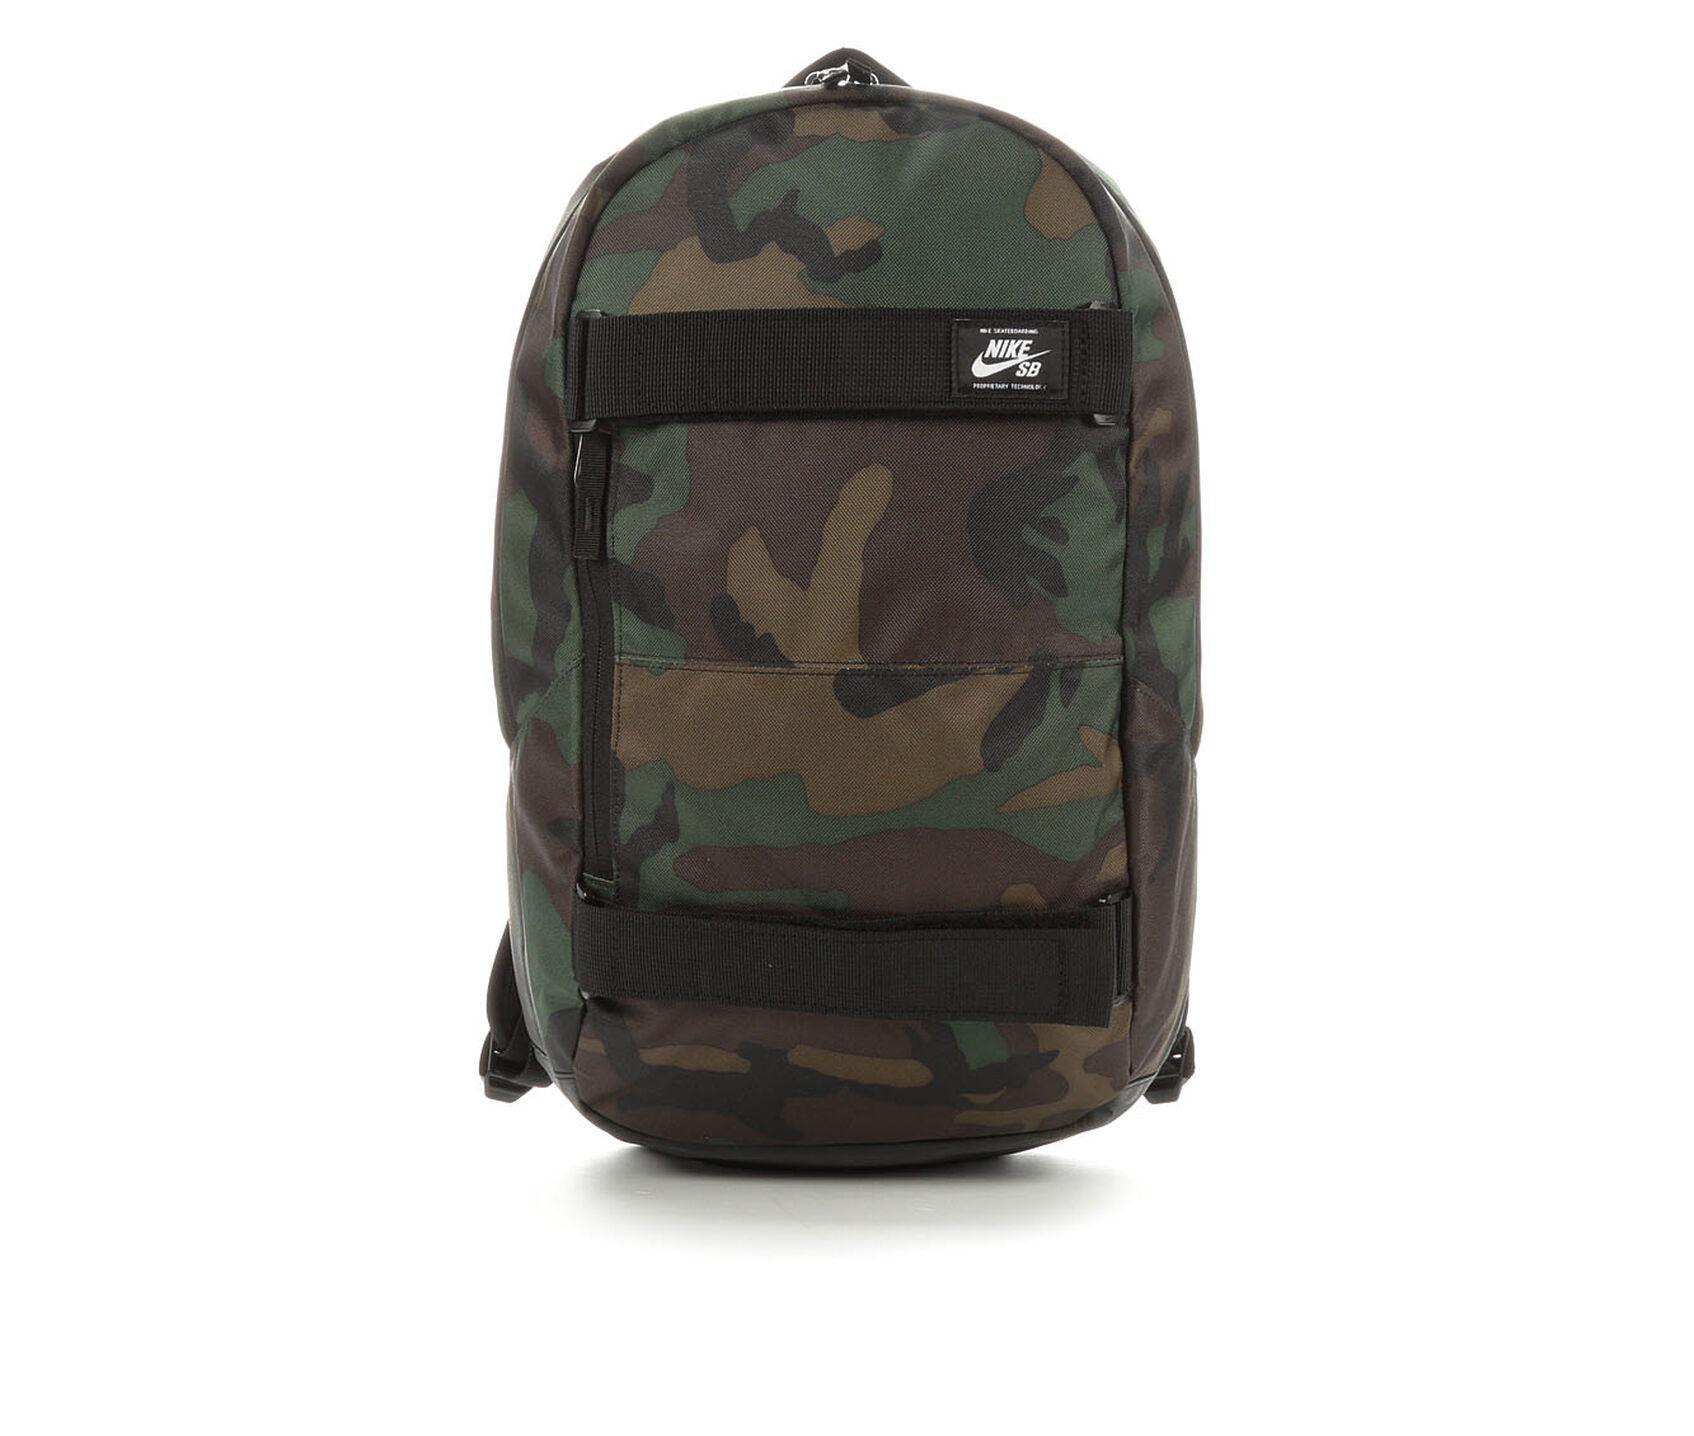 e687f4c9dd3b Nike SB Print Backpack. Previous